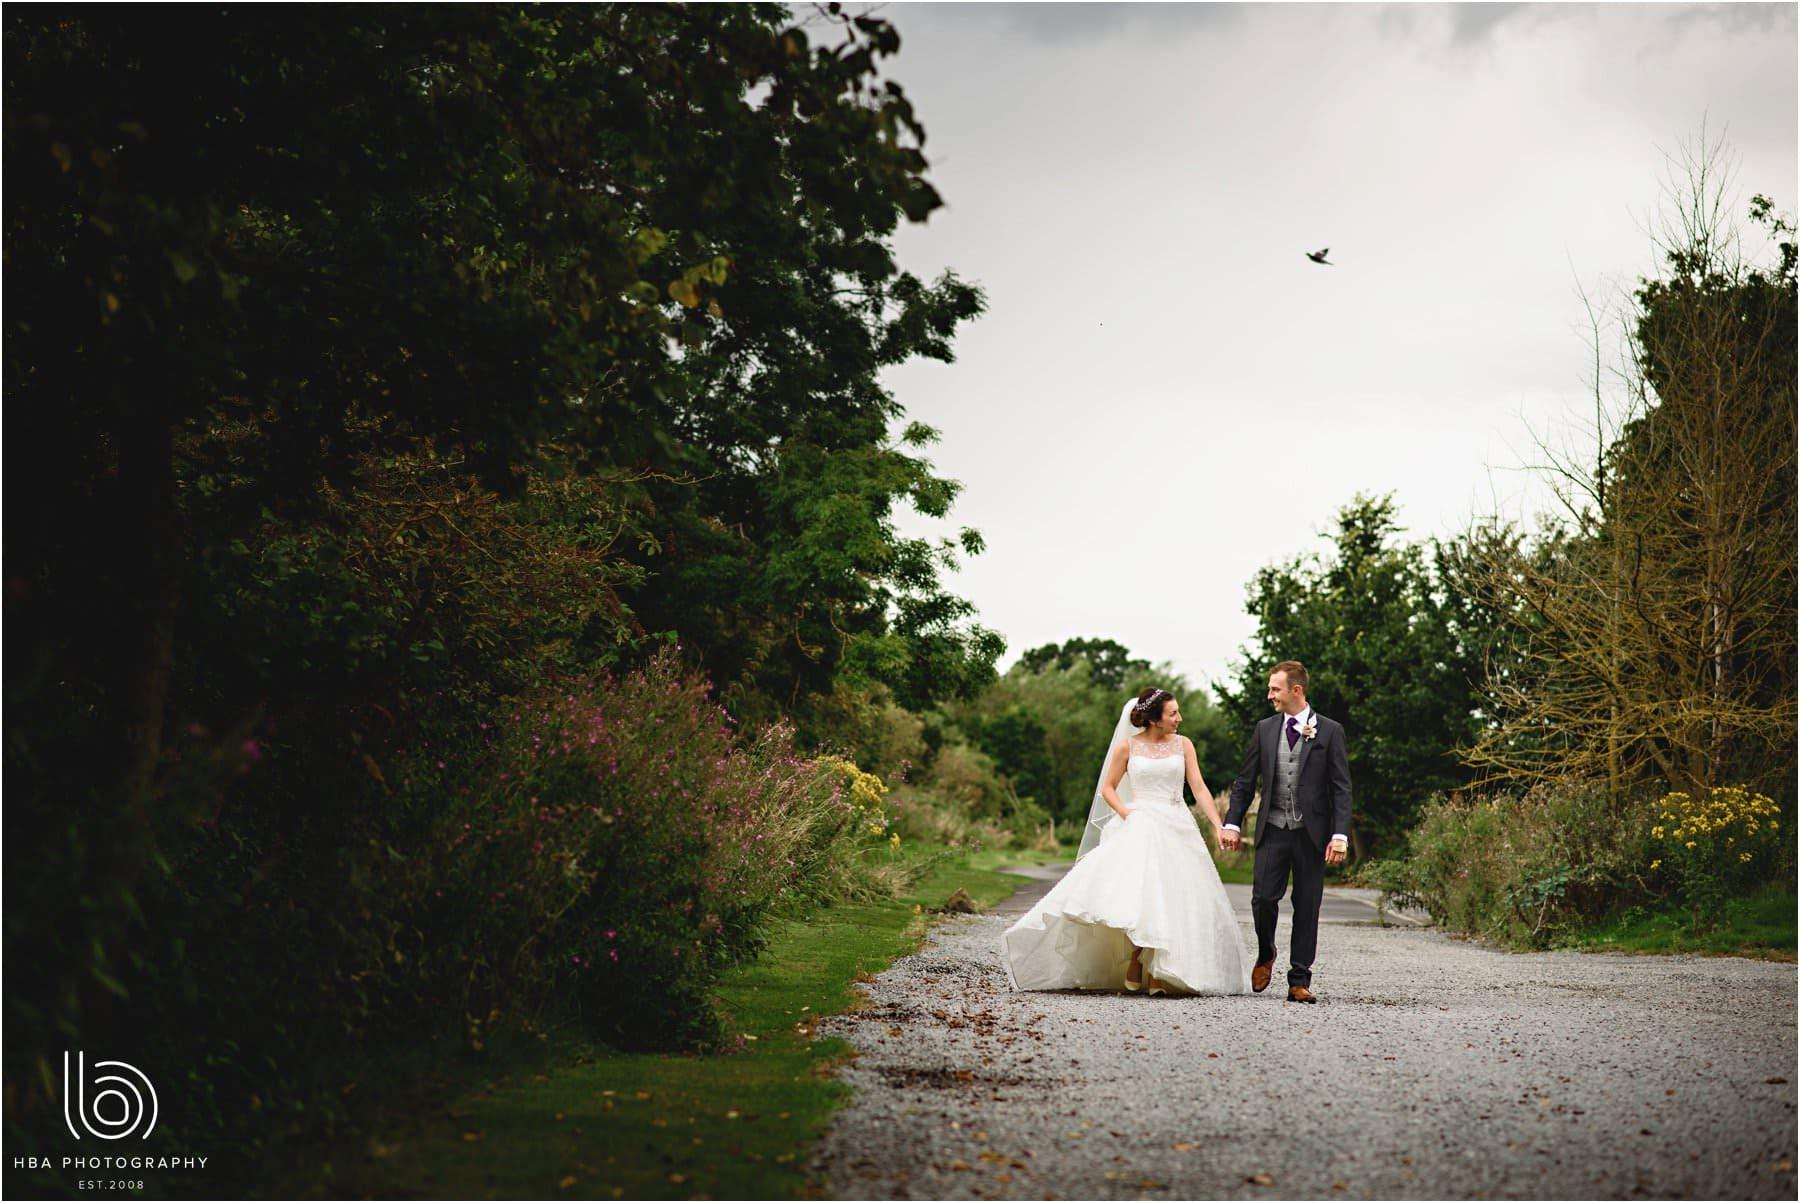 the bride & groom walking down the road at Shustoke]